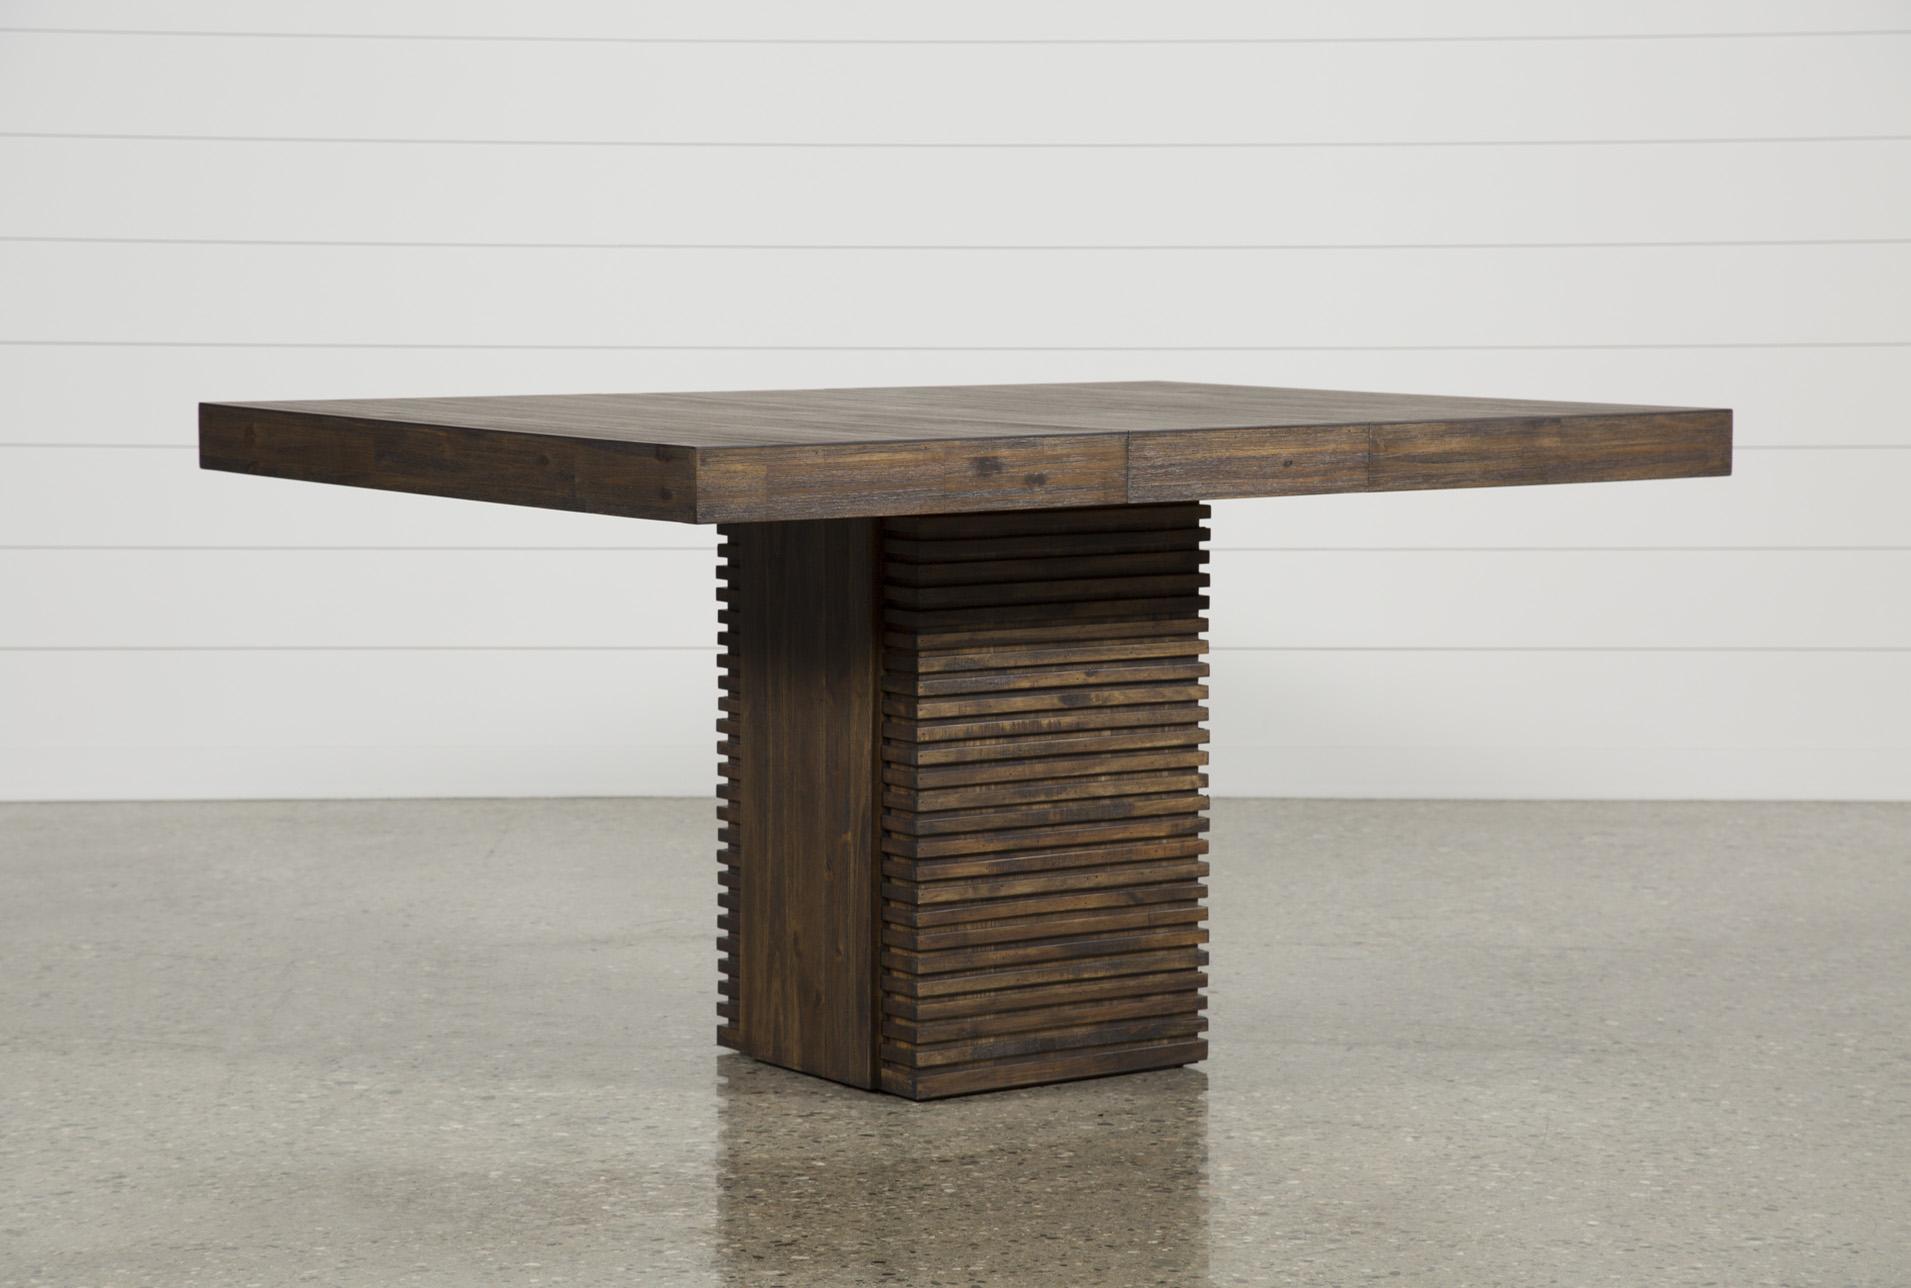 Charmant Teagan Counter Table   360